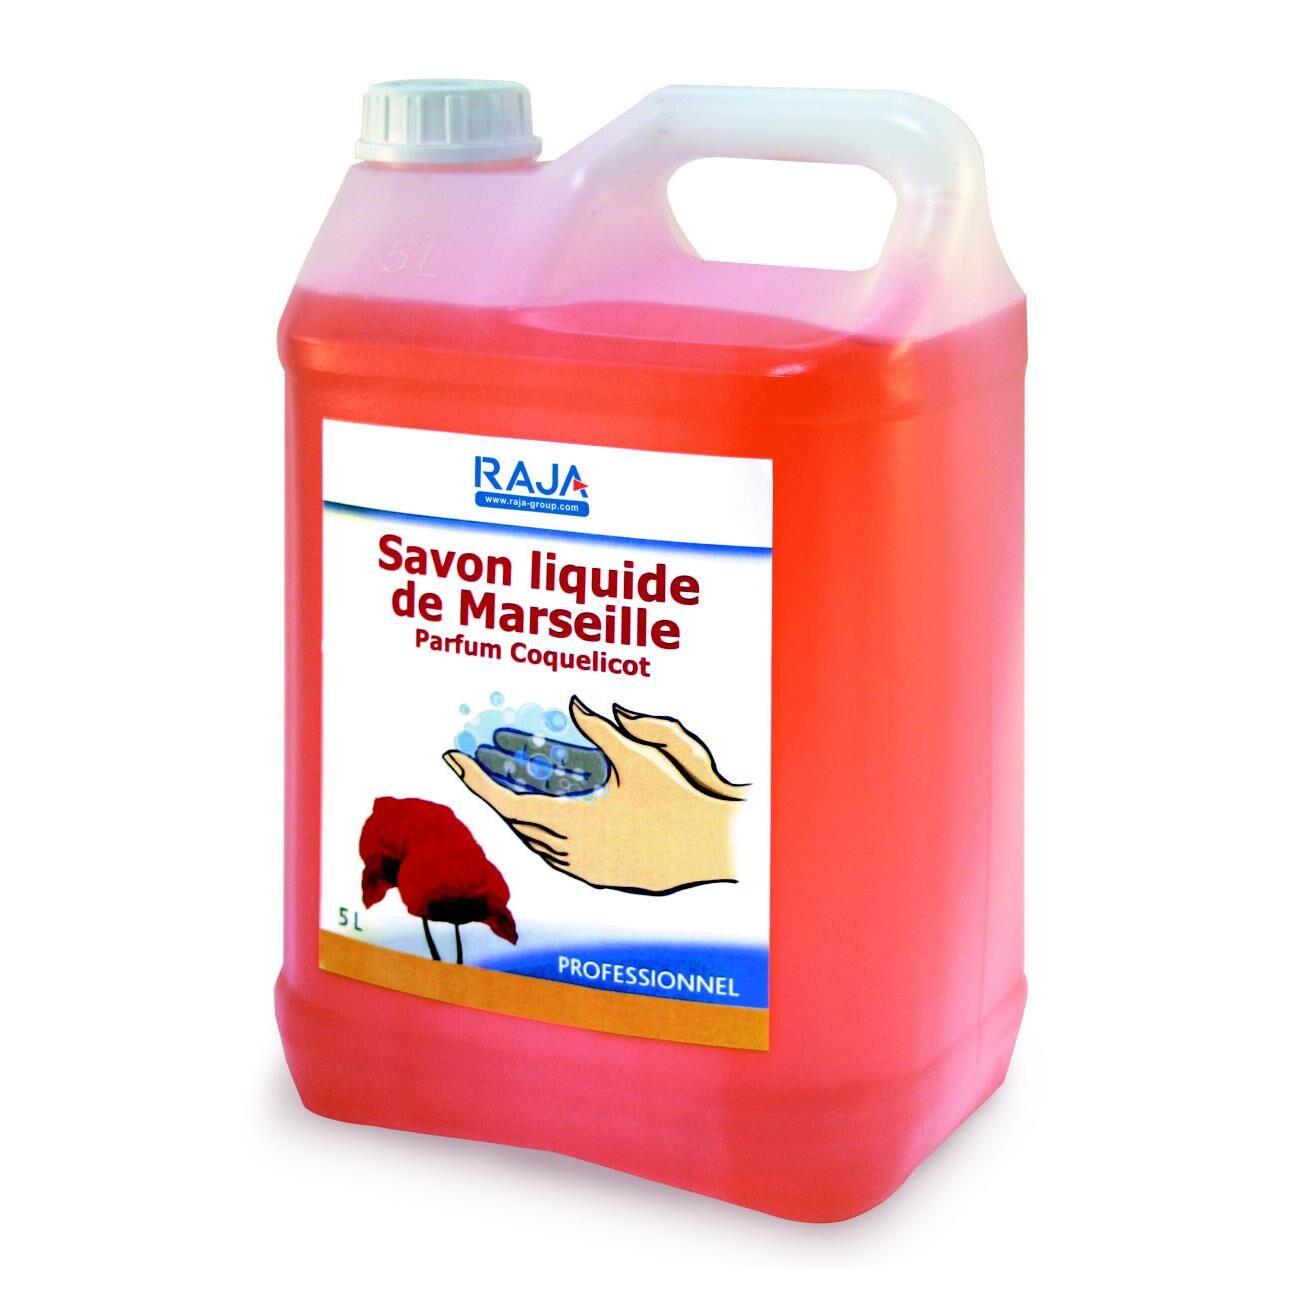 Raja Savon liquide de Marseille Raja - parfum coquelicot - bidon 5 litres